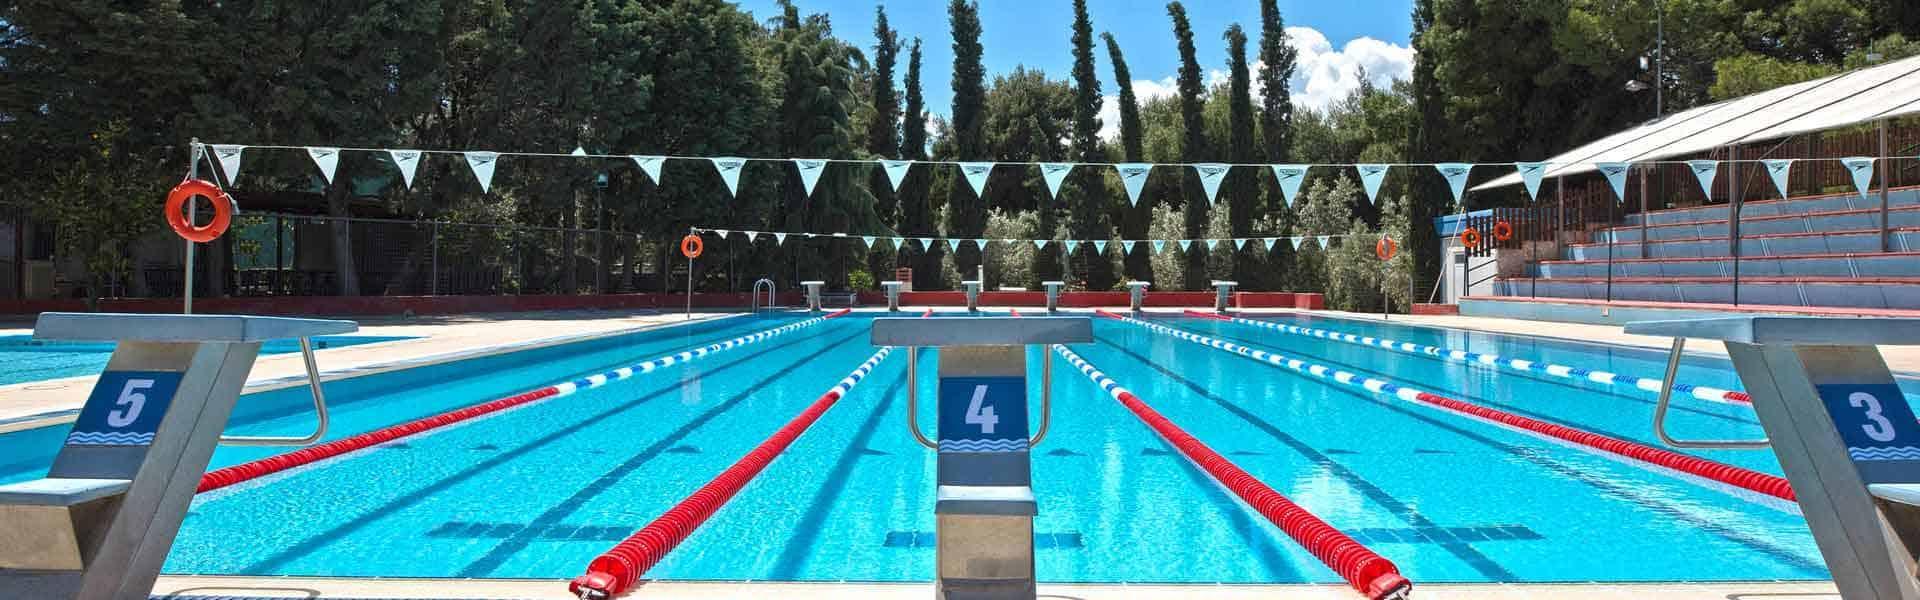 Sportcamp swimming pool